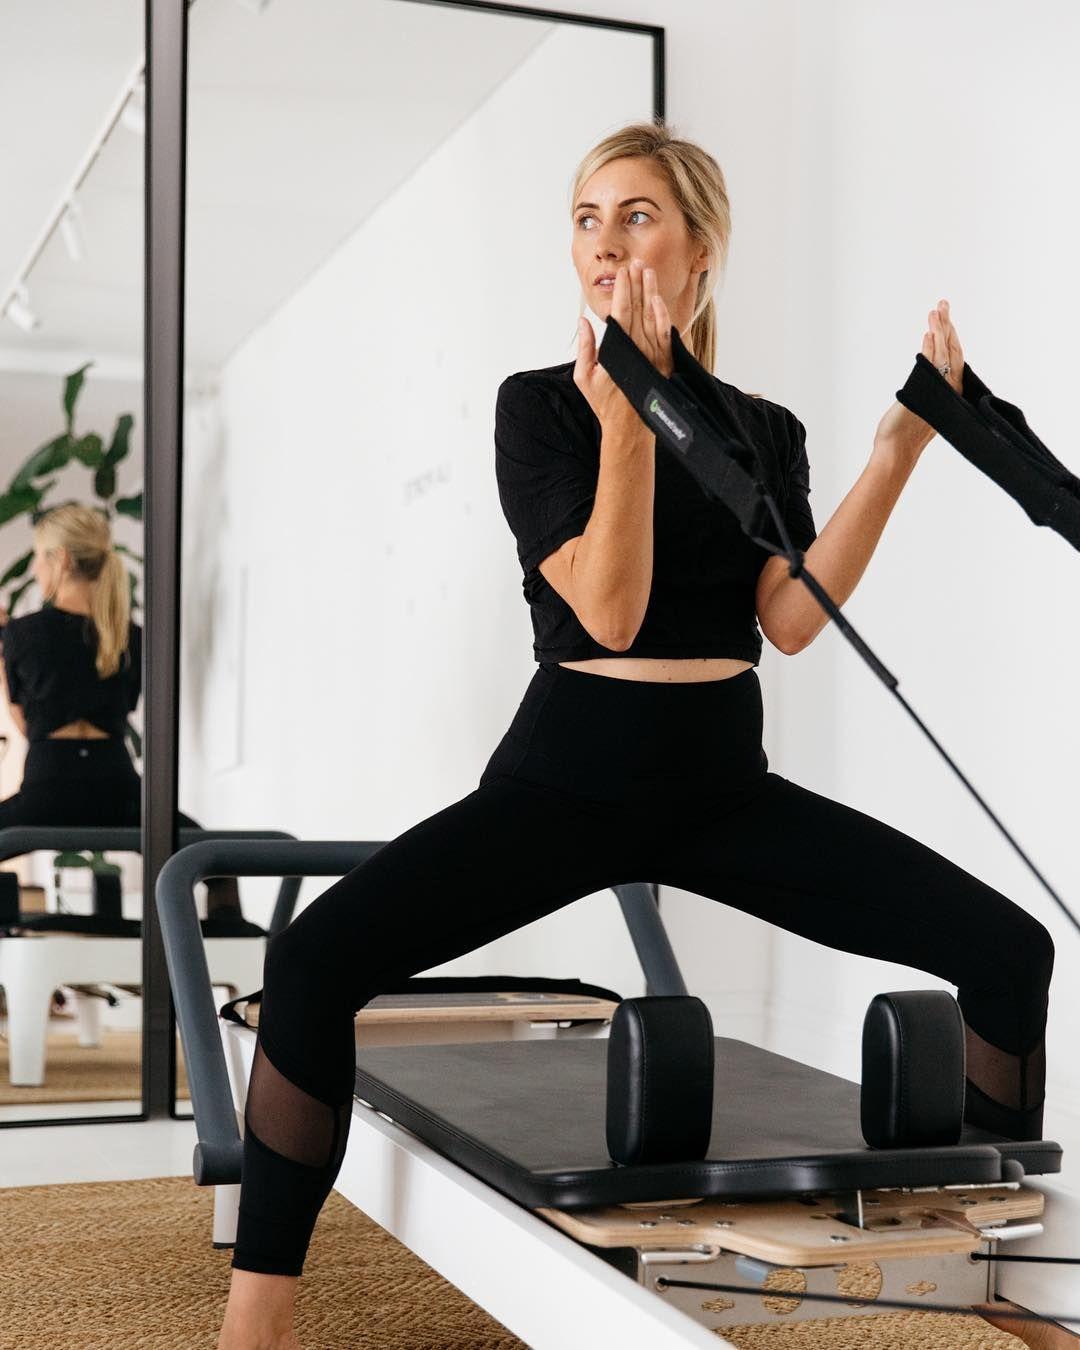 Fluidform Pilates Das Workout Der Topmodels Pilates Training Muskelaufbau Bauchmuskeln